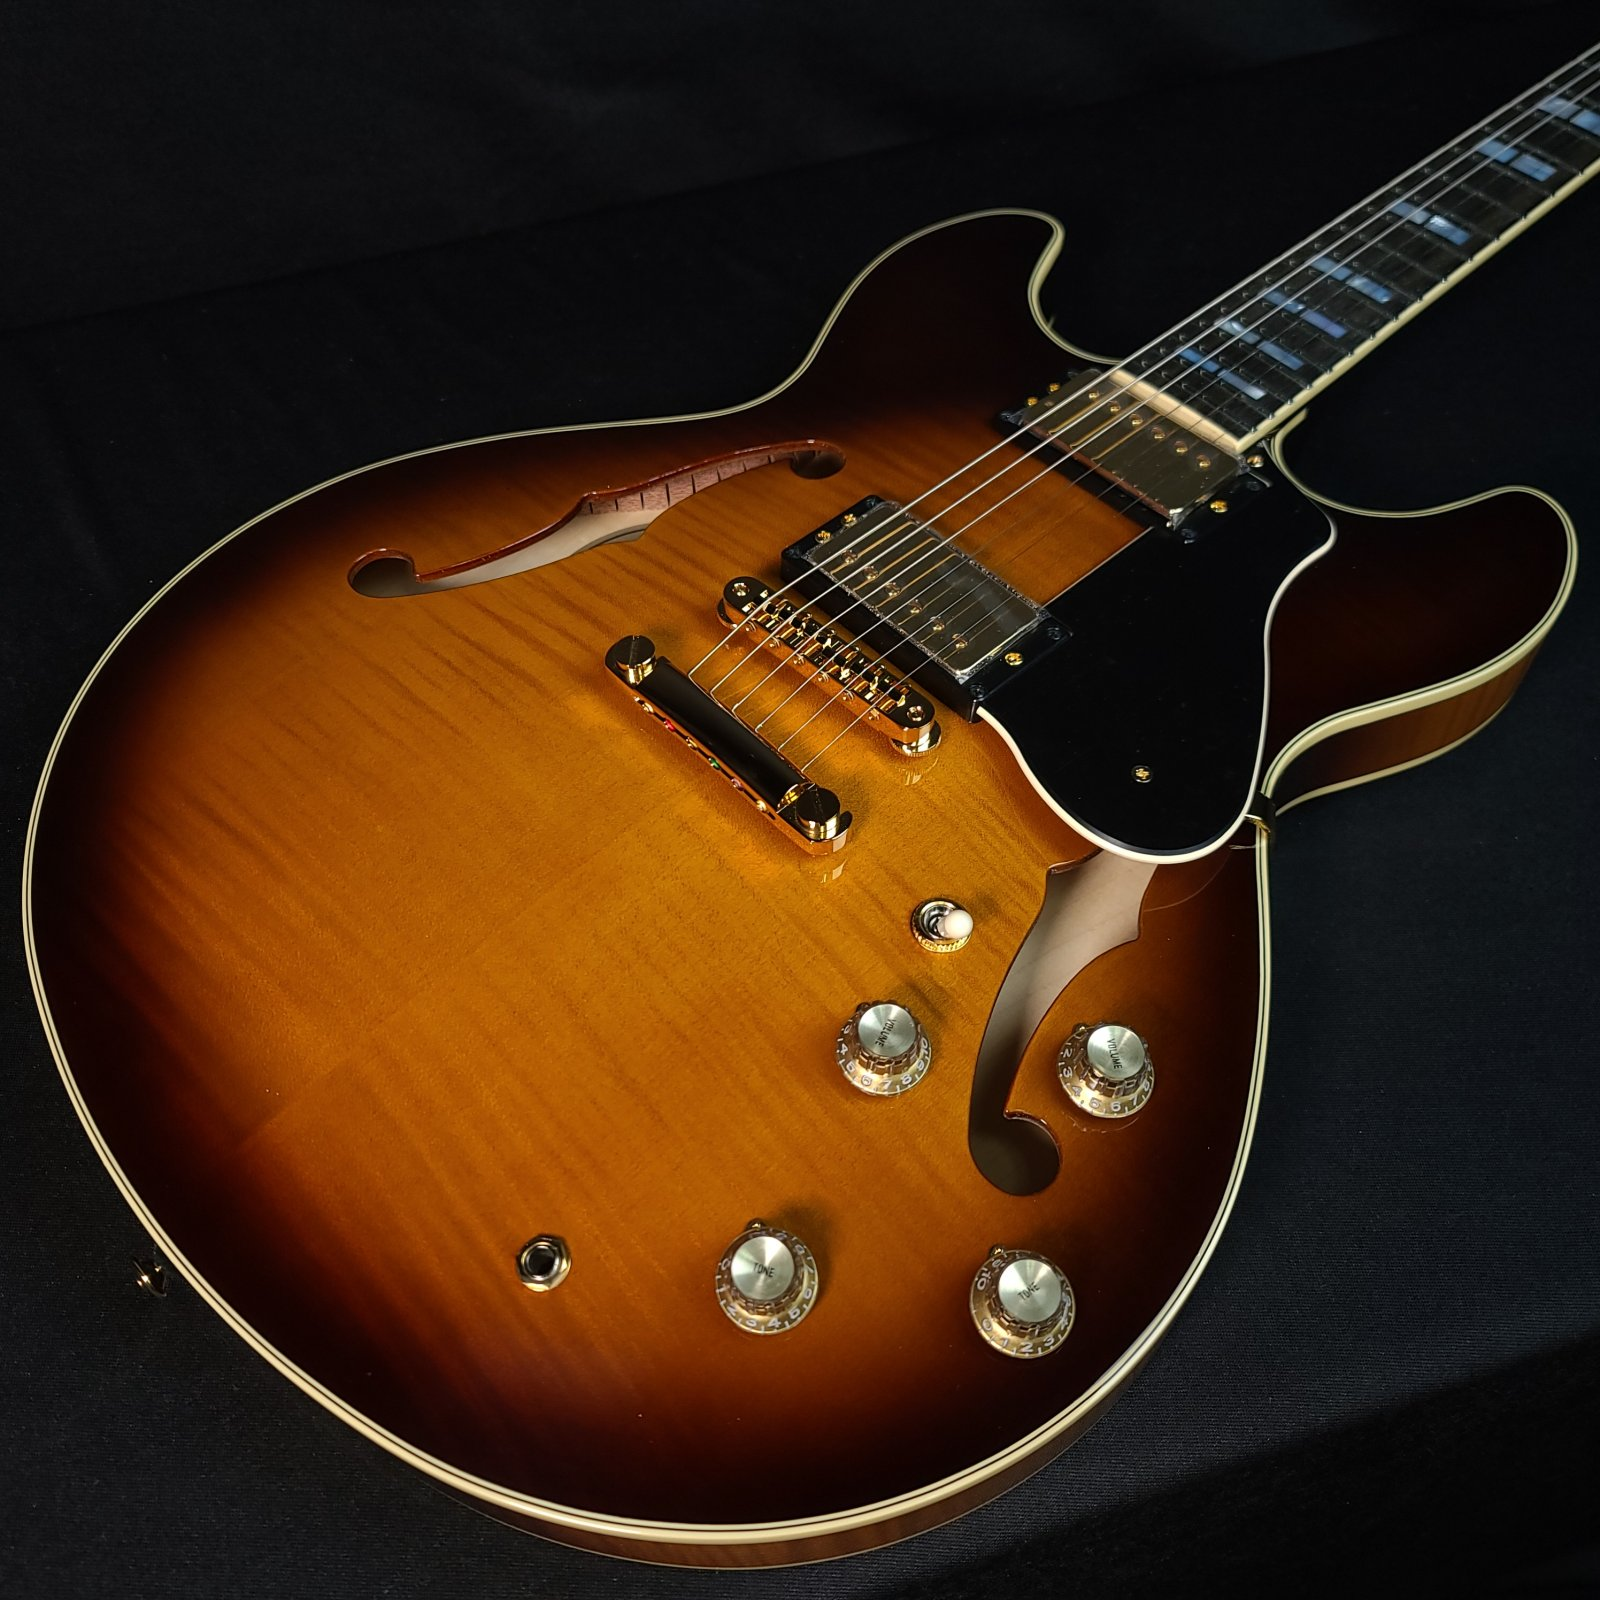 Yamaha SA2200 Brown Sunburst B-Stock Thinline Guitar